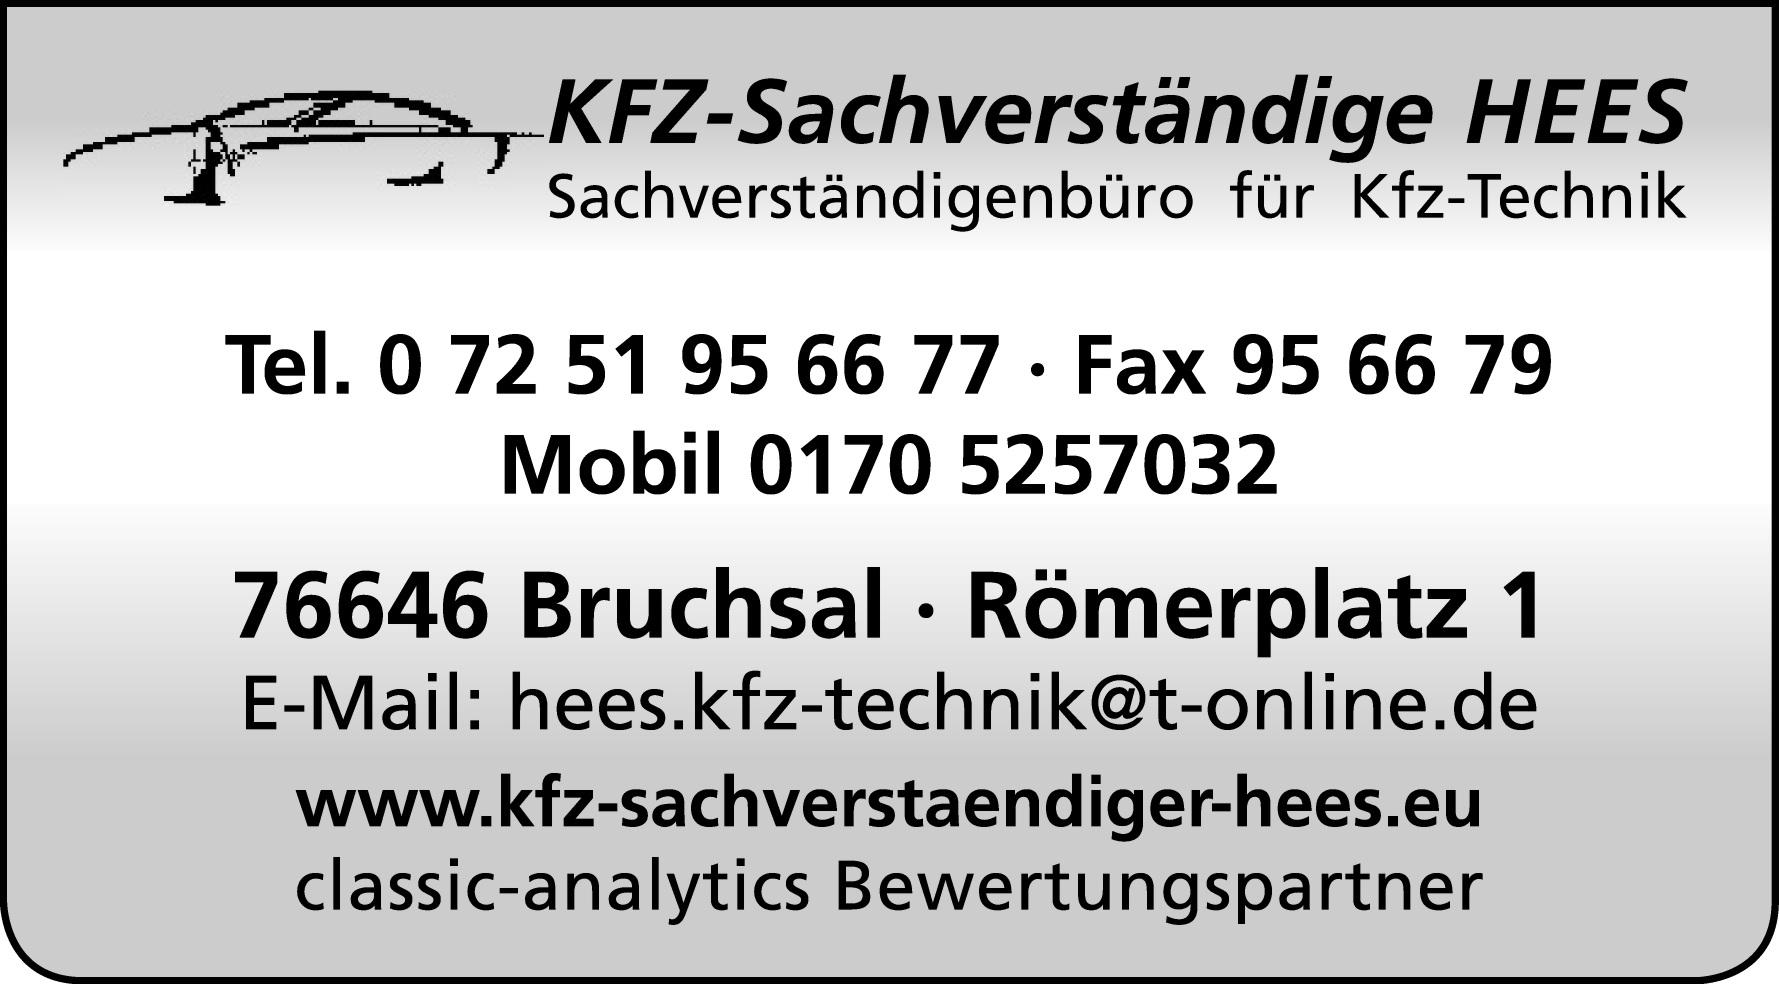 KFZ-Sachverständige HEES